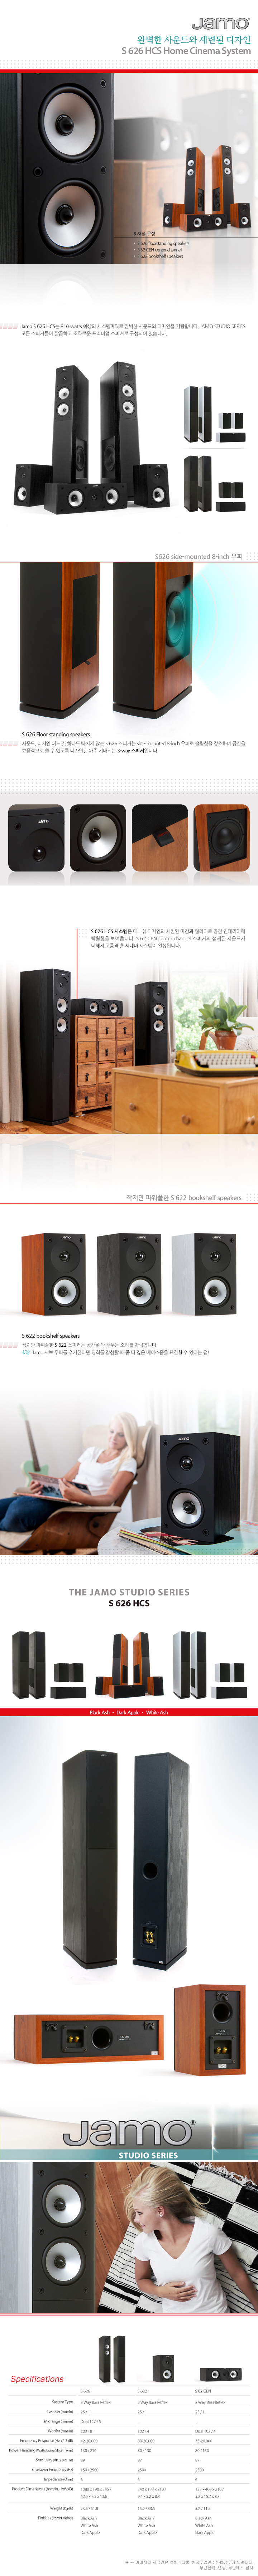 S 626 HCS Home Cinema System